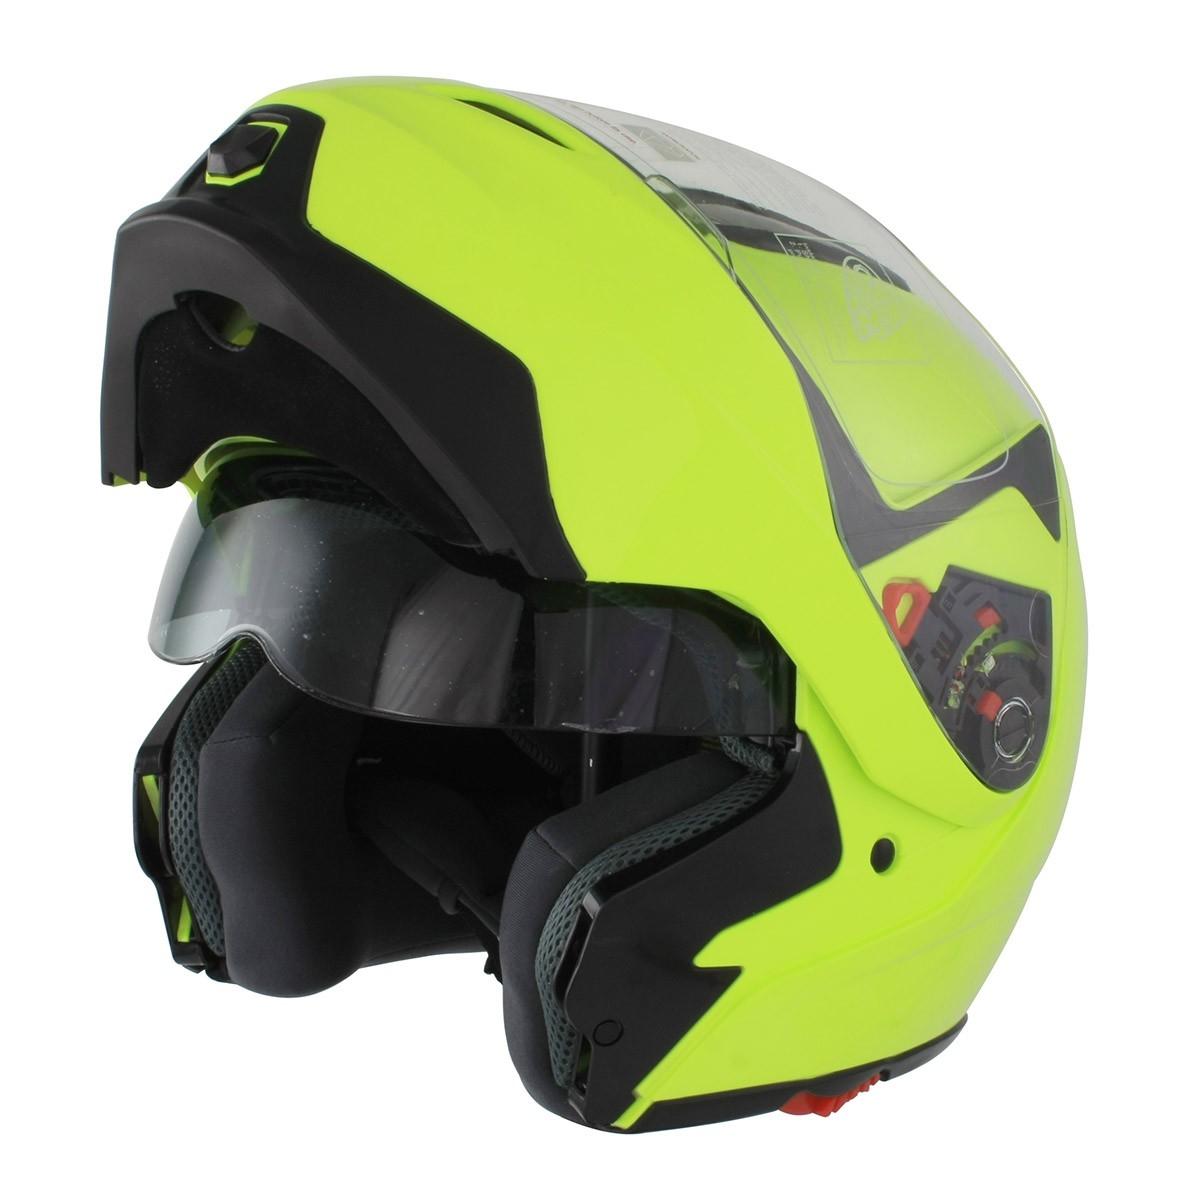 【GSB】G-339 Road 可掀式安全帽 - 「Webike-摩托百貨」